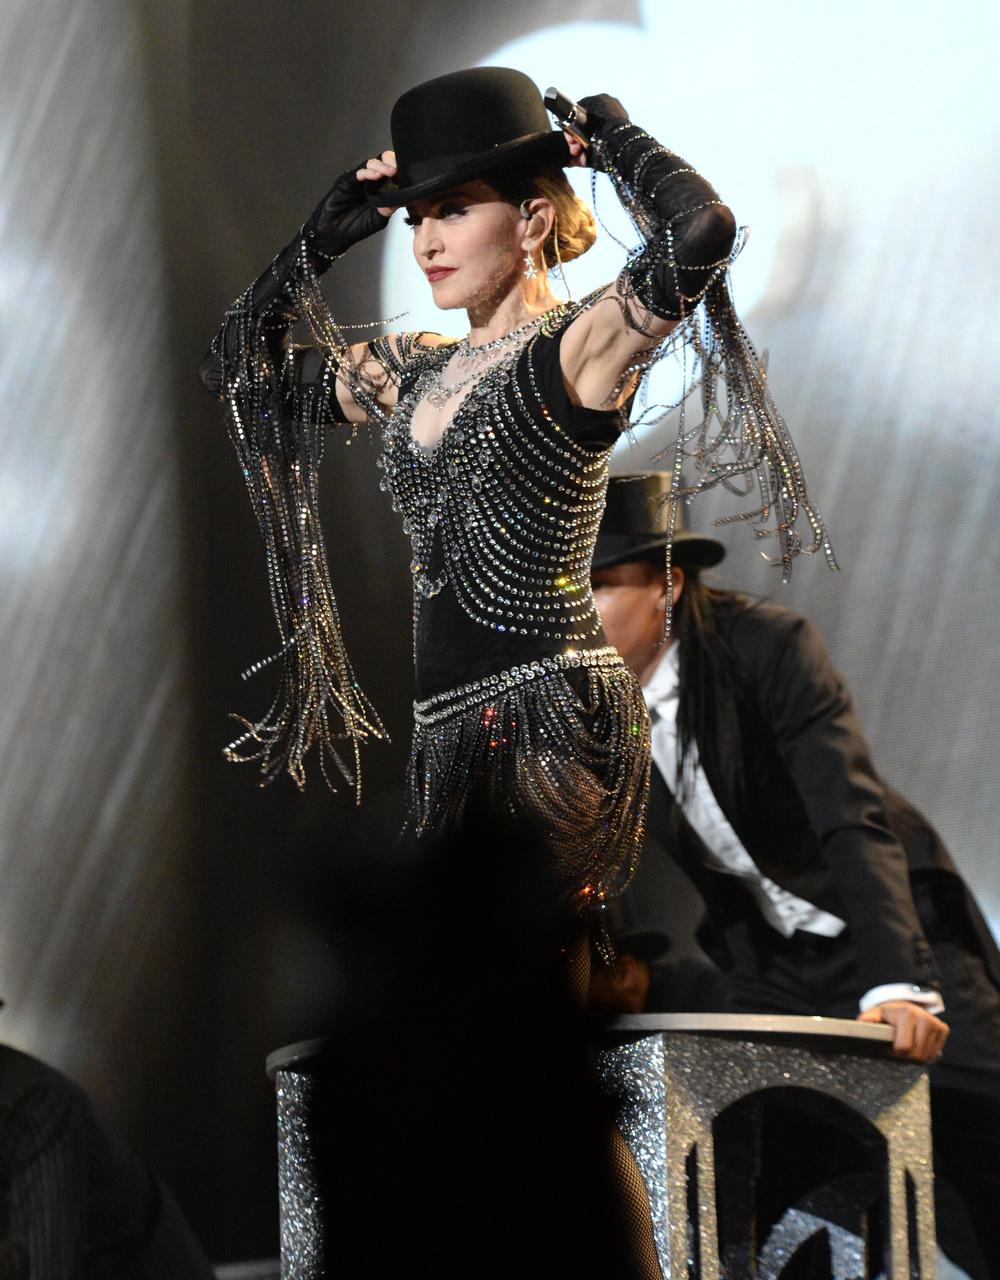 576711507LL072_Madonna_Rebe.JPG